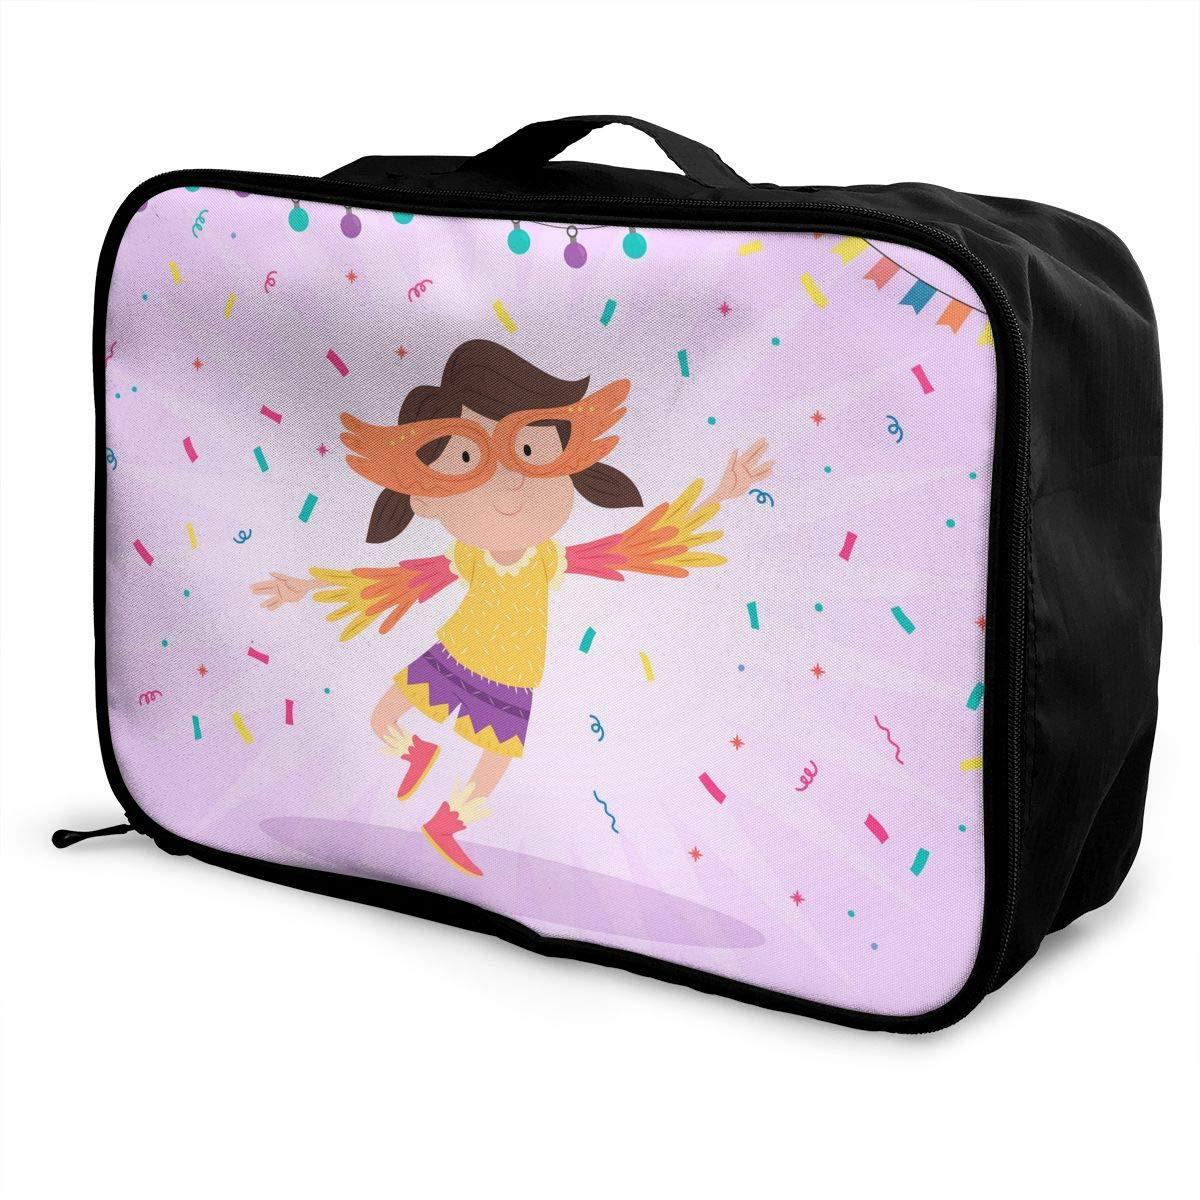 InterestPrint Large Duffel Bag Flowers Flight Bag Gym Bag Cute Baby Sloth